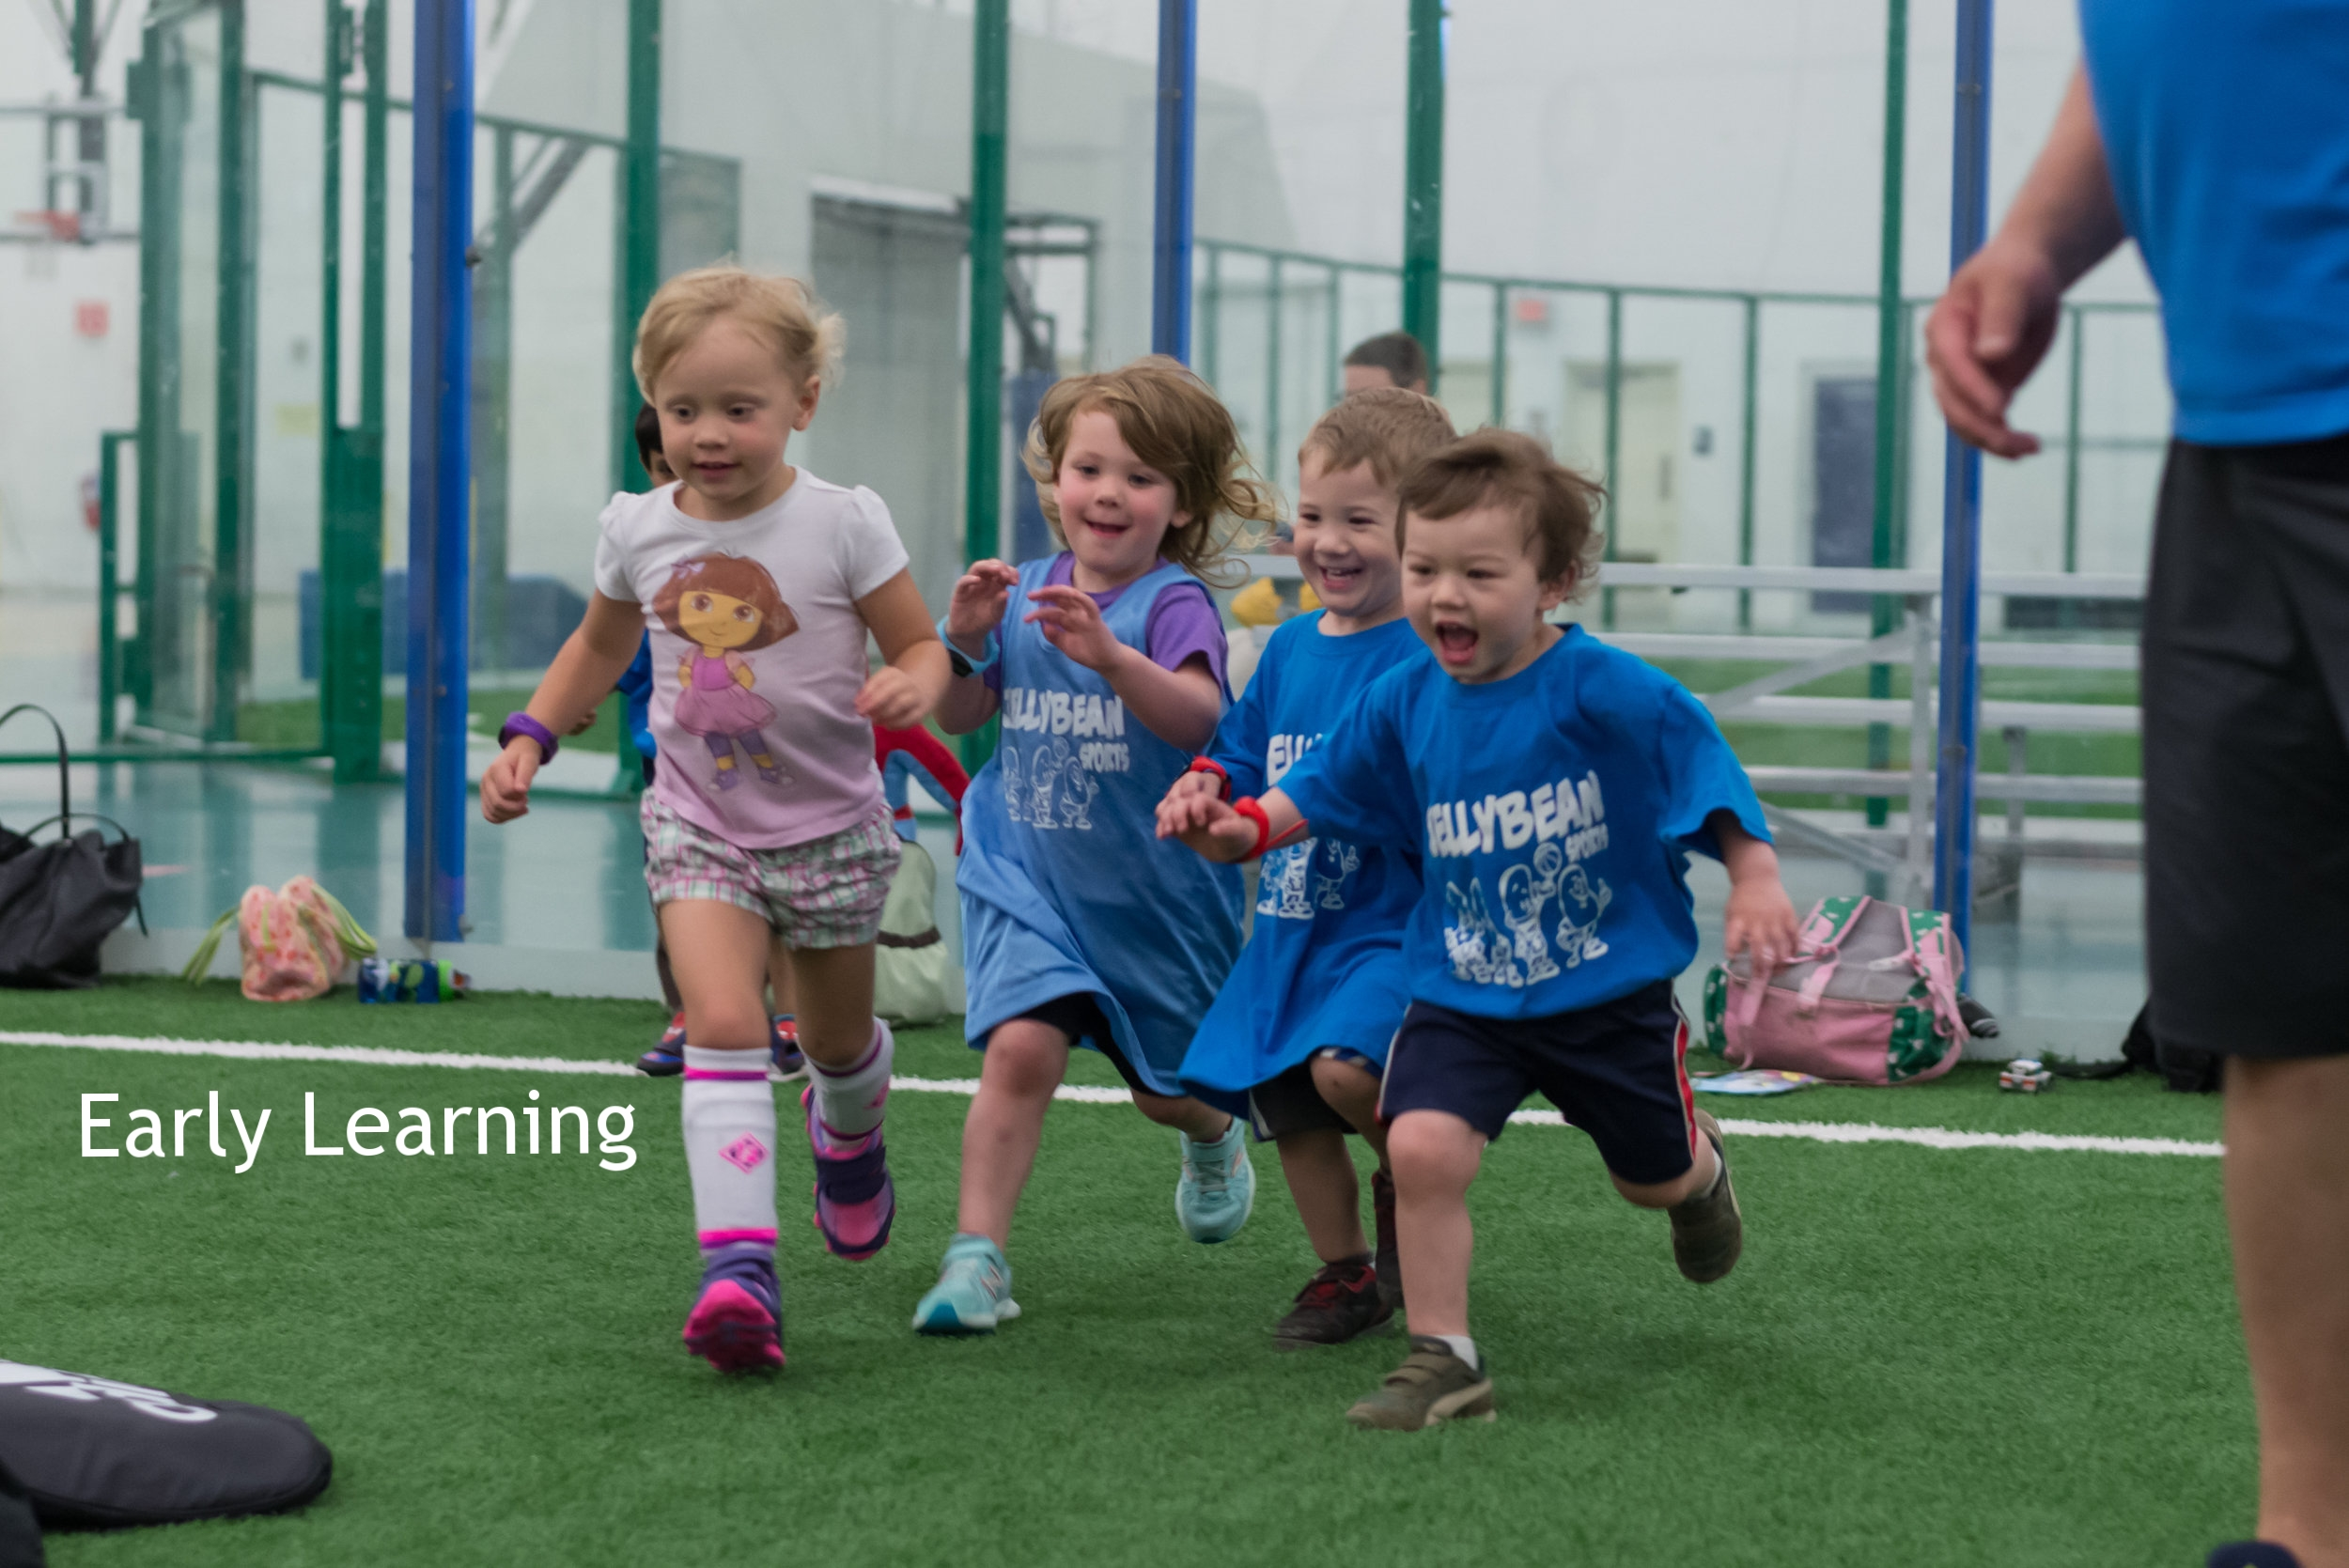 Kids running in a sports class